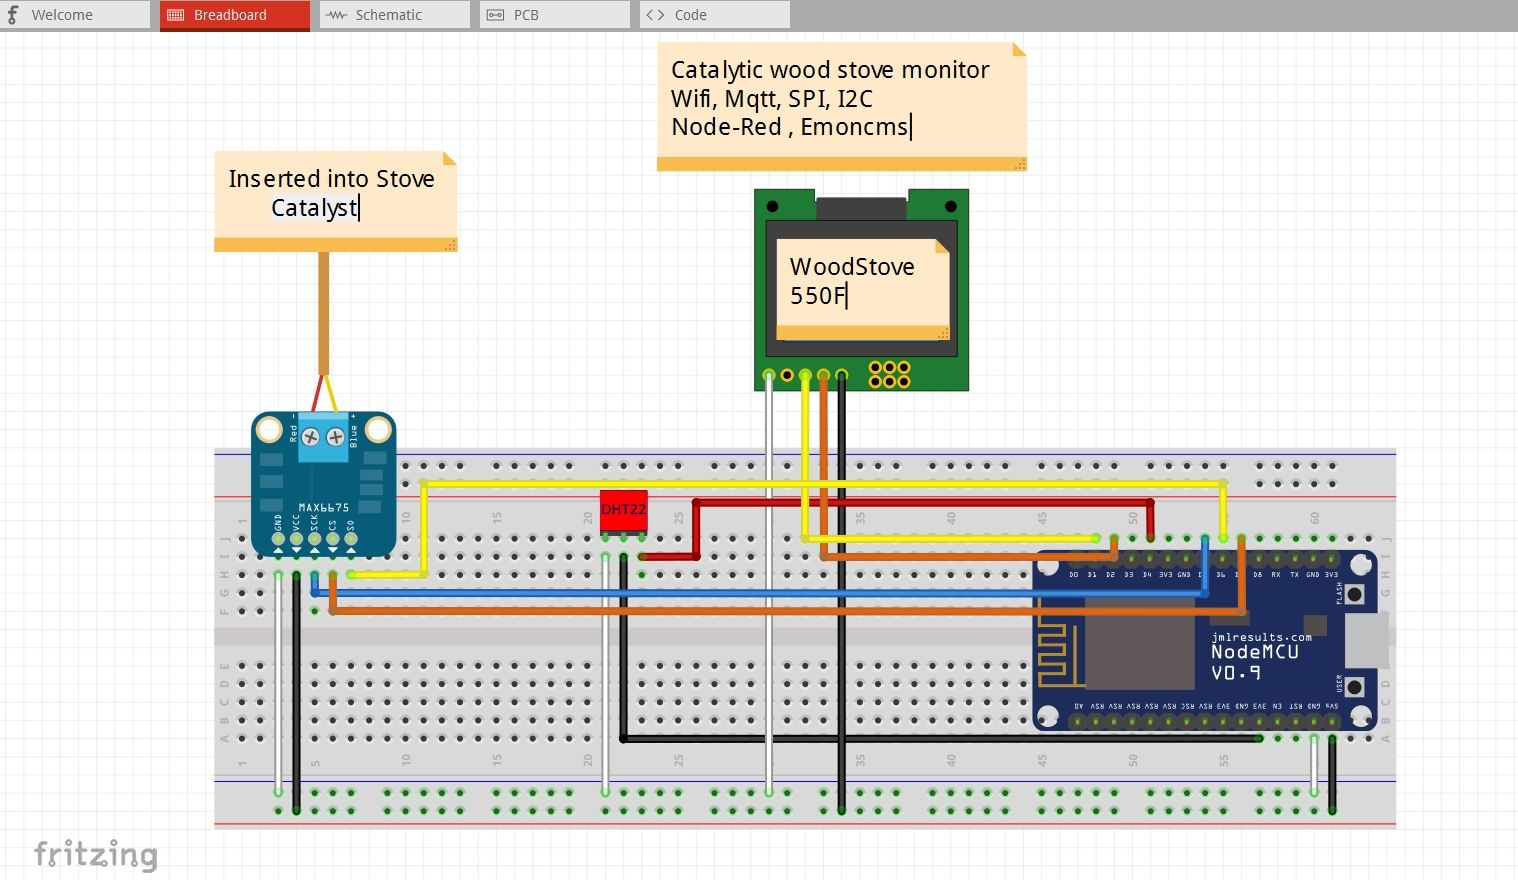 esp8266-catalytic-wood-stove-monitor Nodemcu v0 9 MQTT